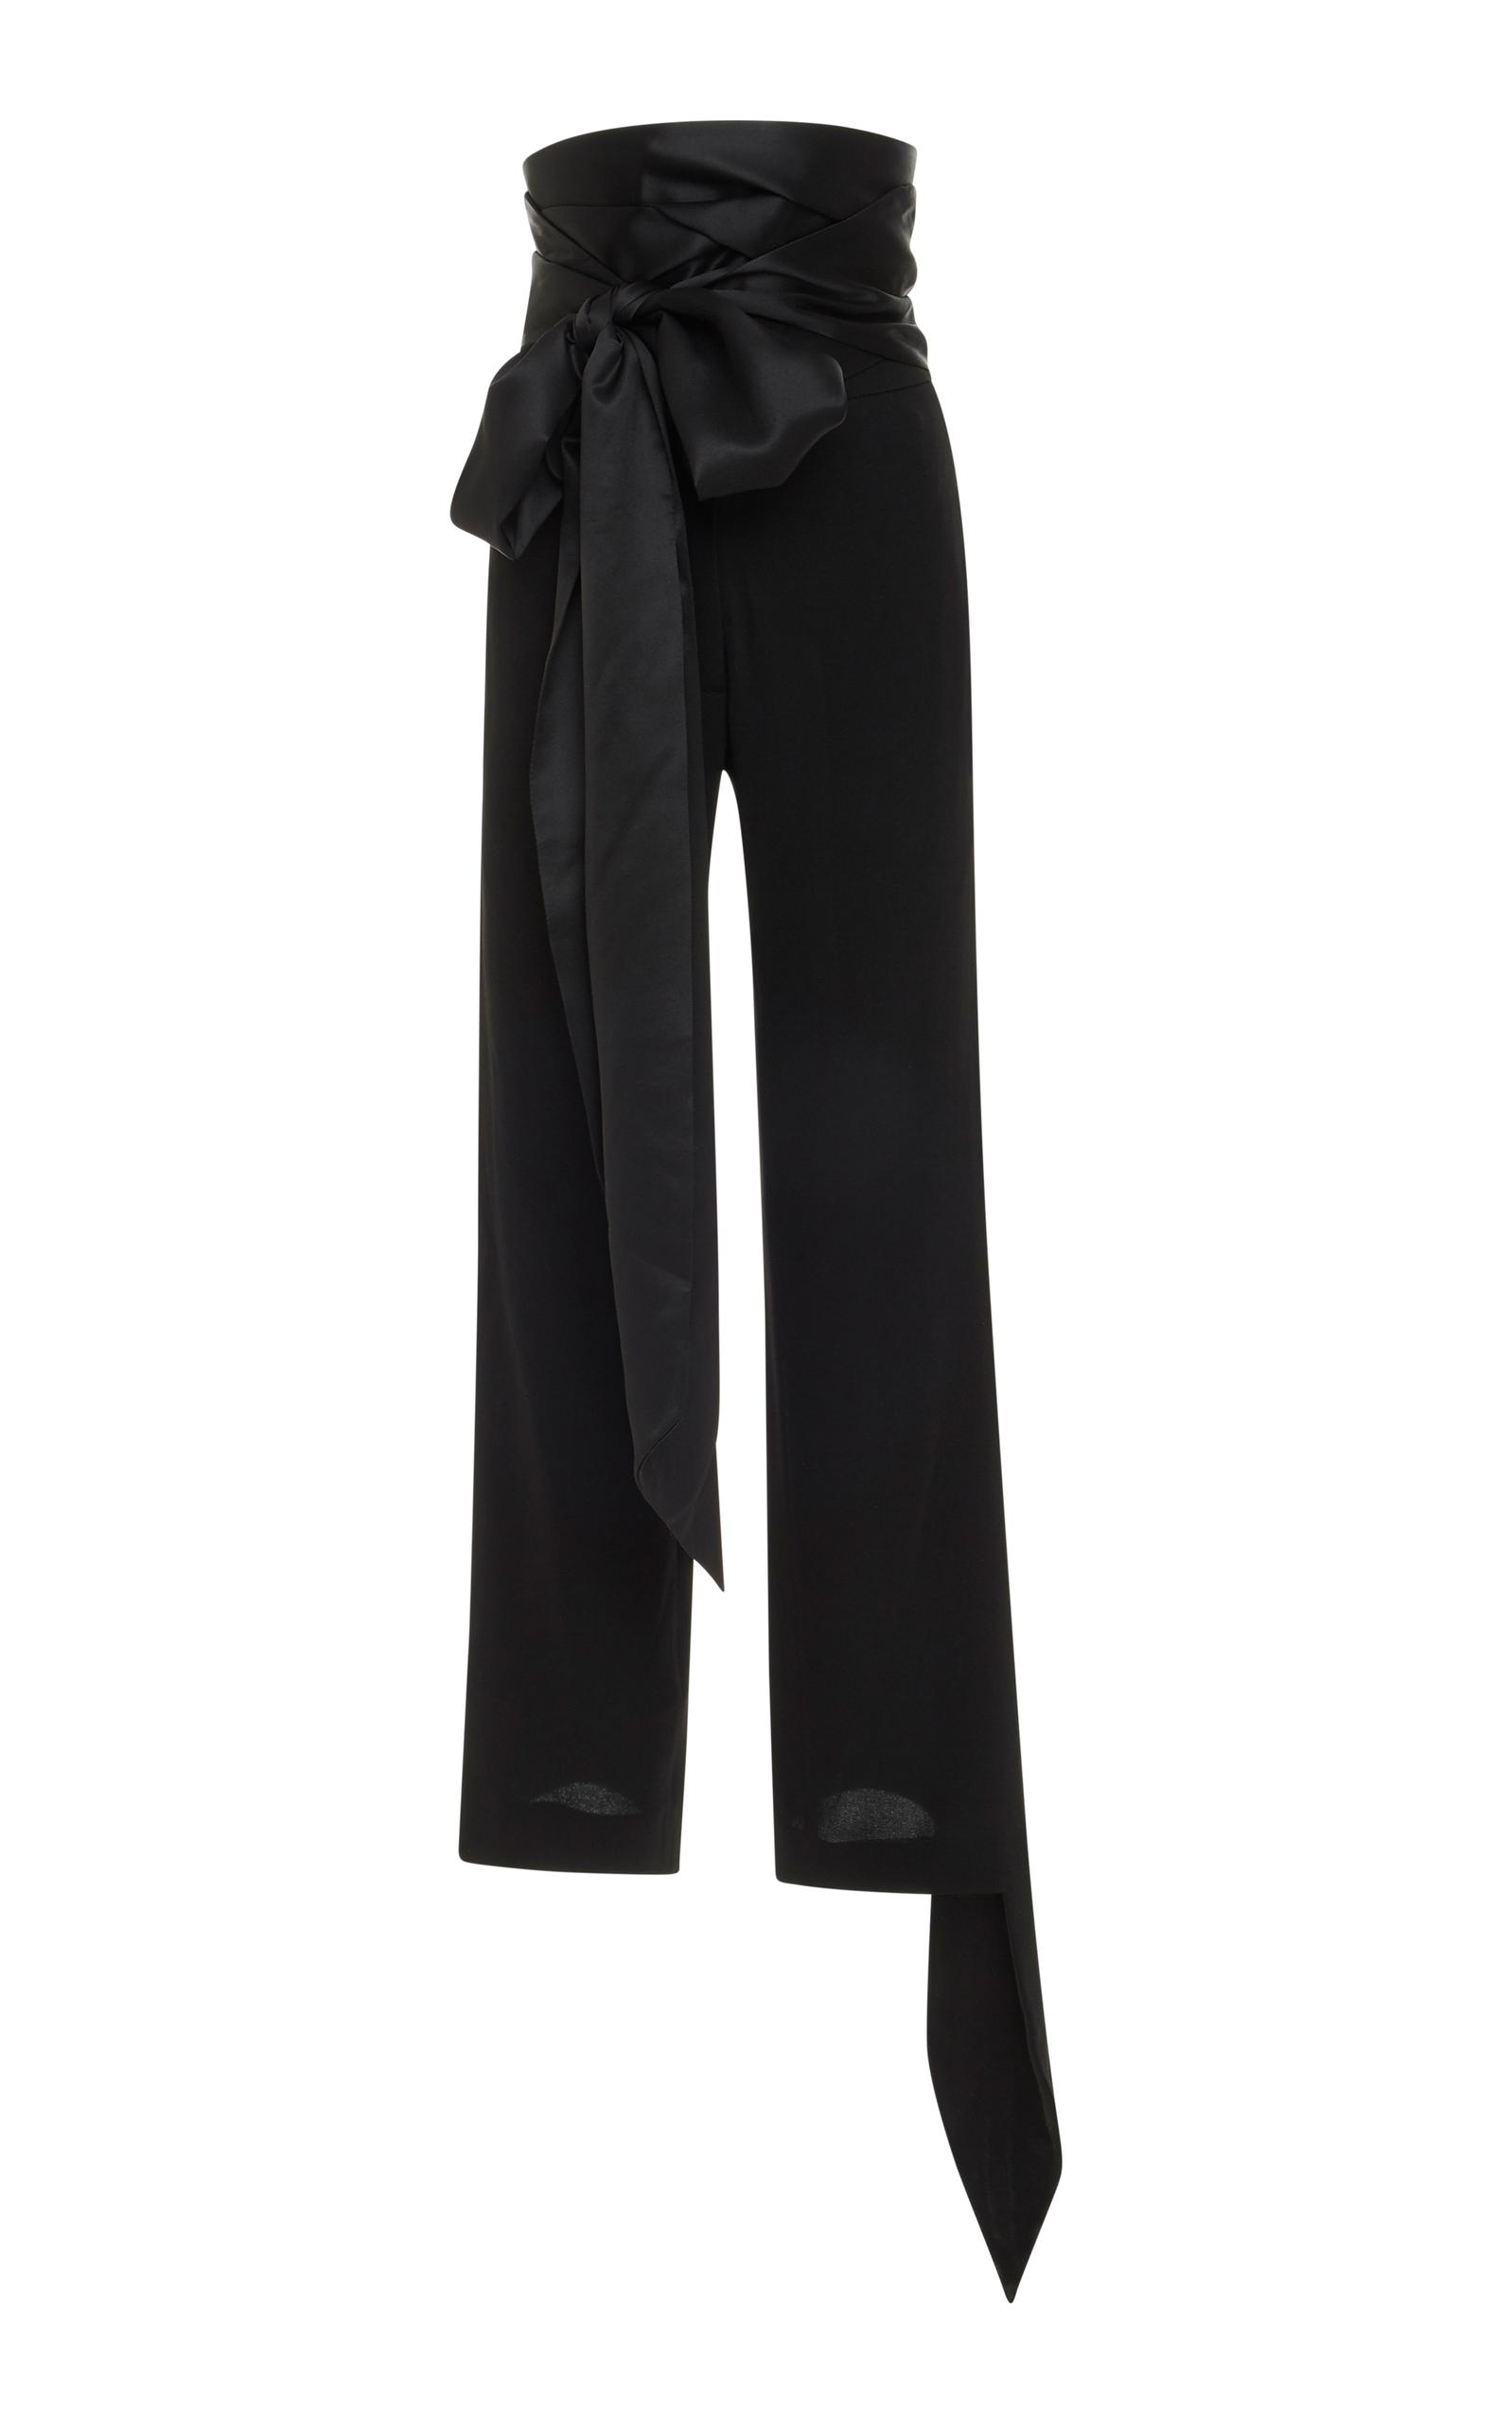 bow embellished trousers - Black J.W.Anderson xJJVmx1yk